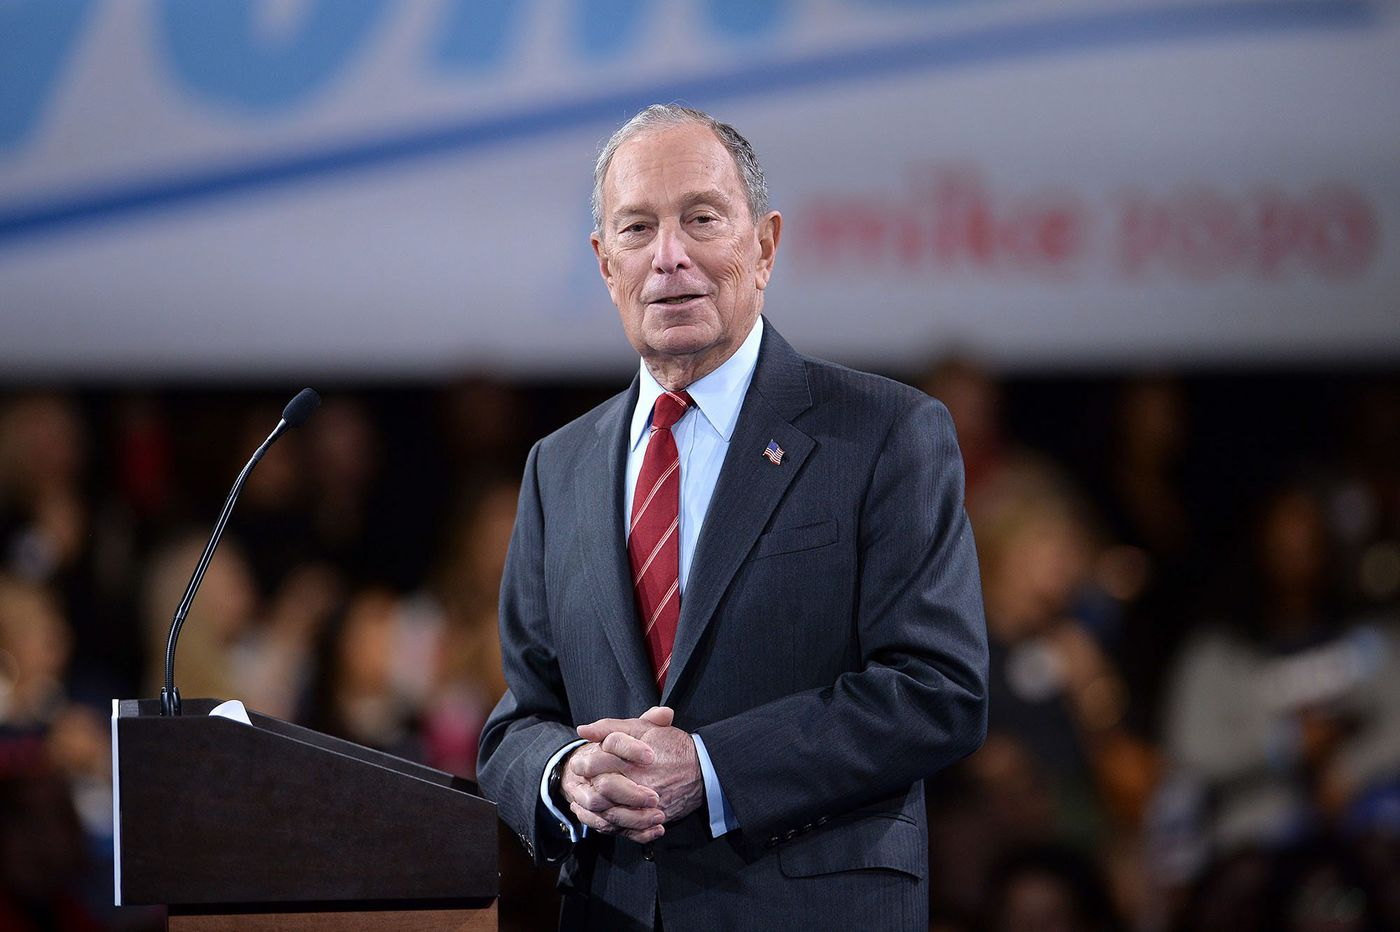 Bernie Sanders, Joe Biden and Amy Klobuchar accuse Mike Bloomberg of trying to buy Democrats' election